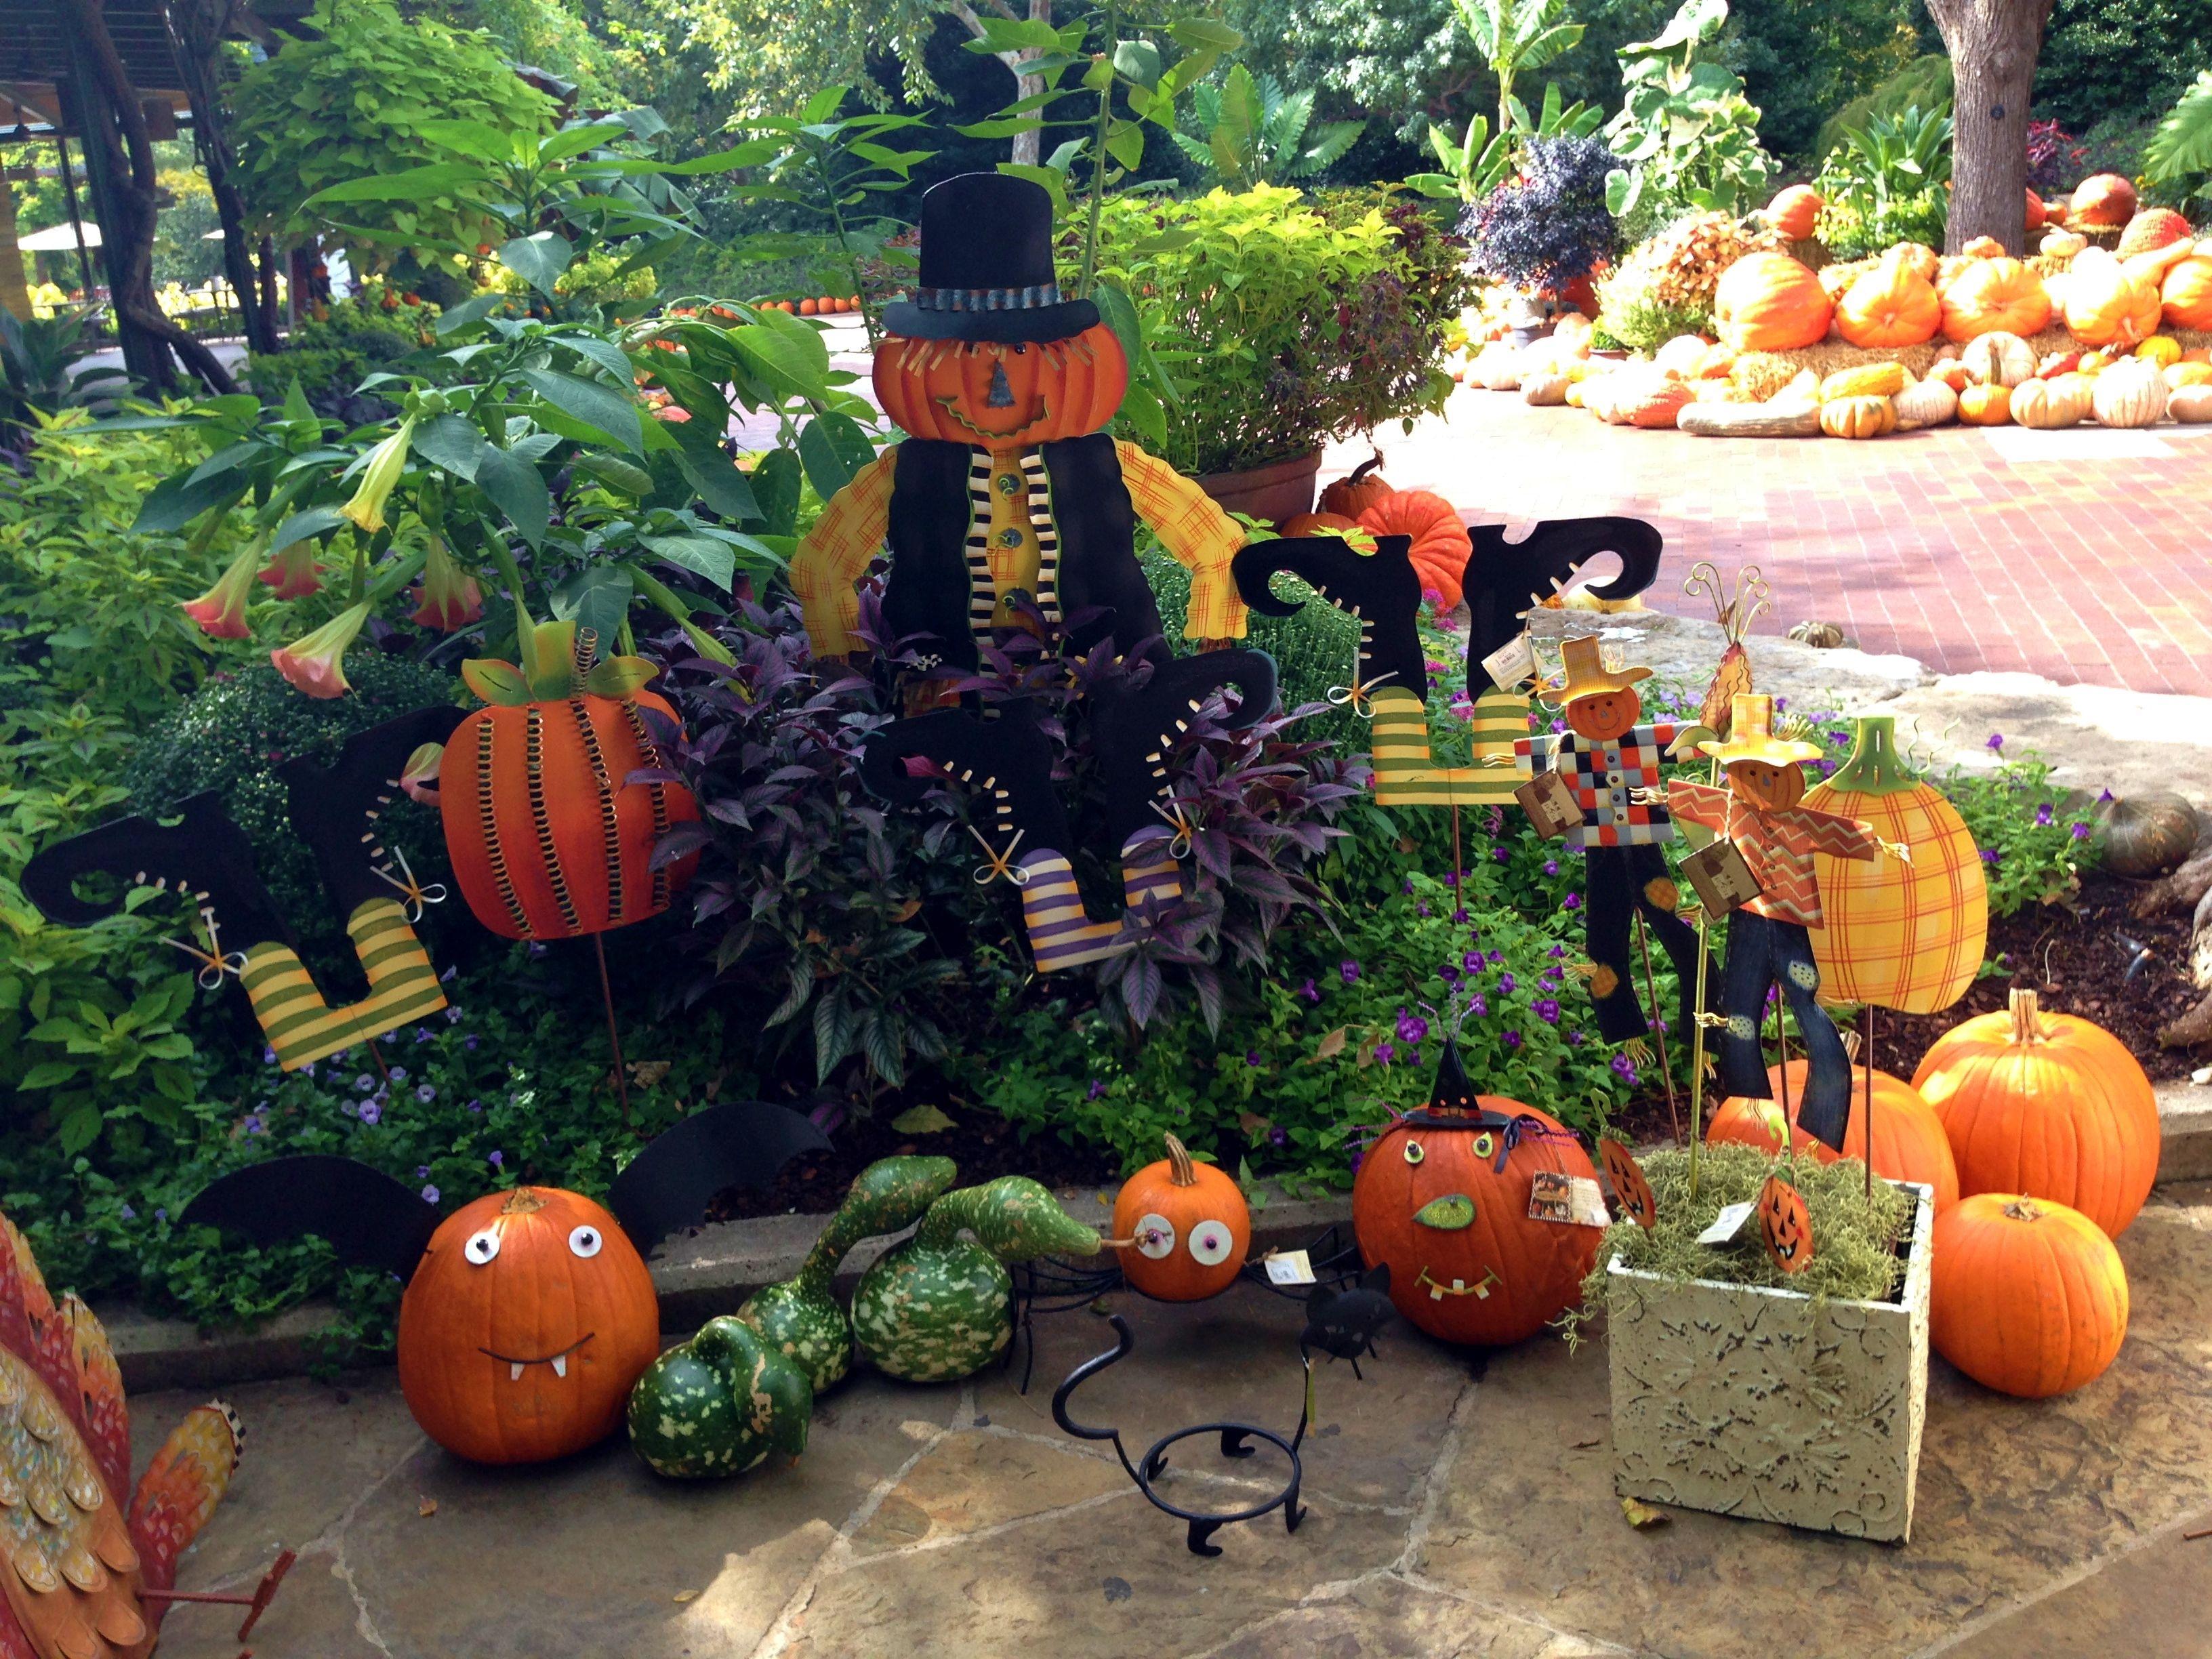 #Halloween goodies at the Dallas Arboretum gift shop!